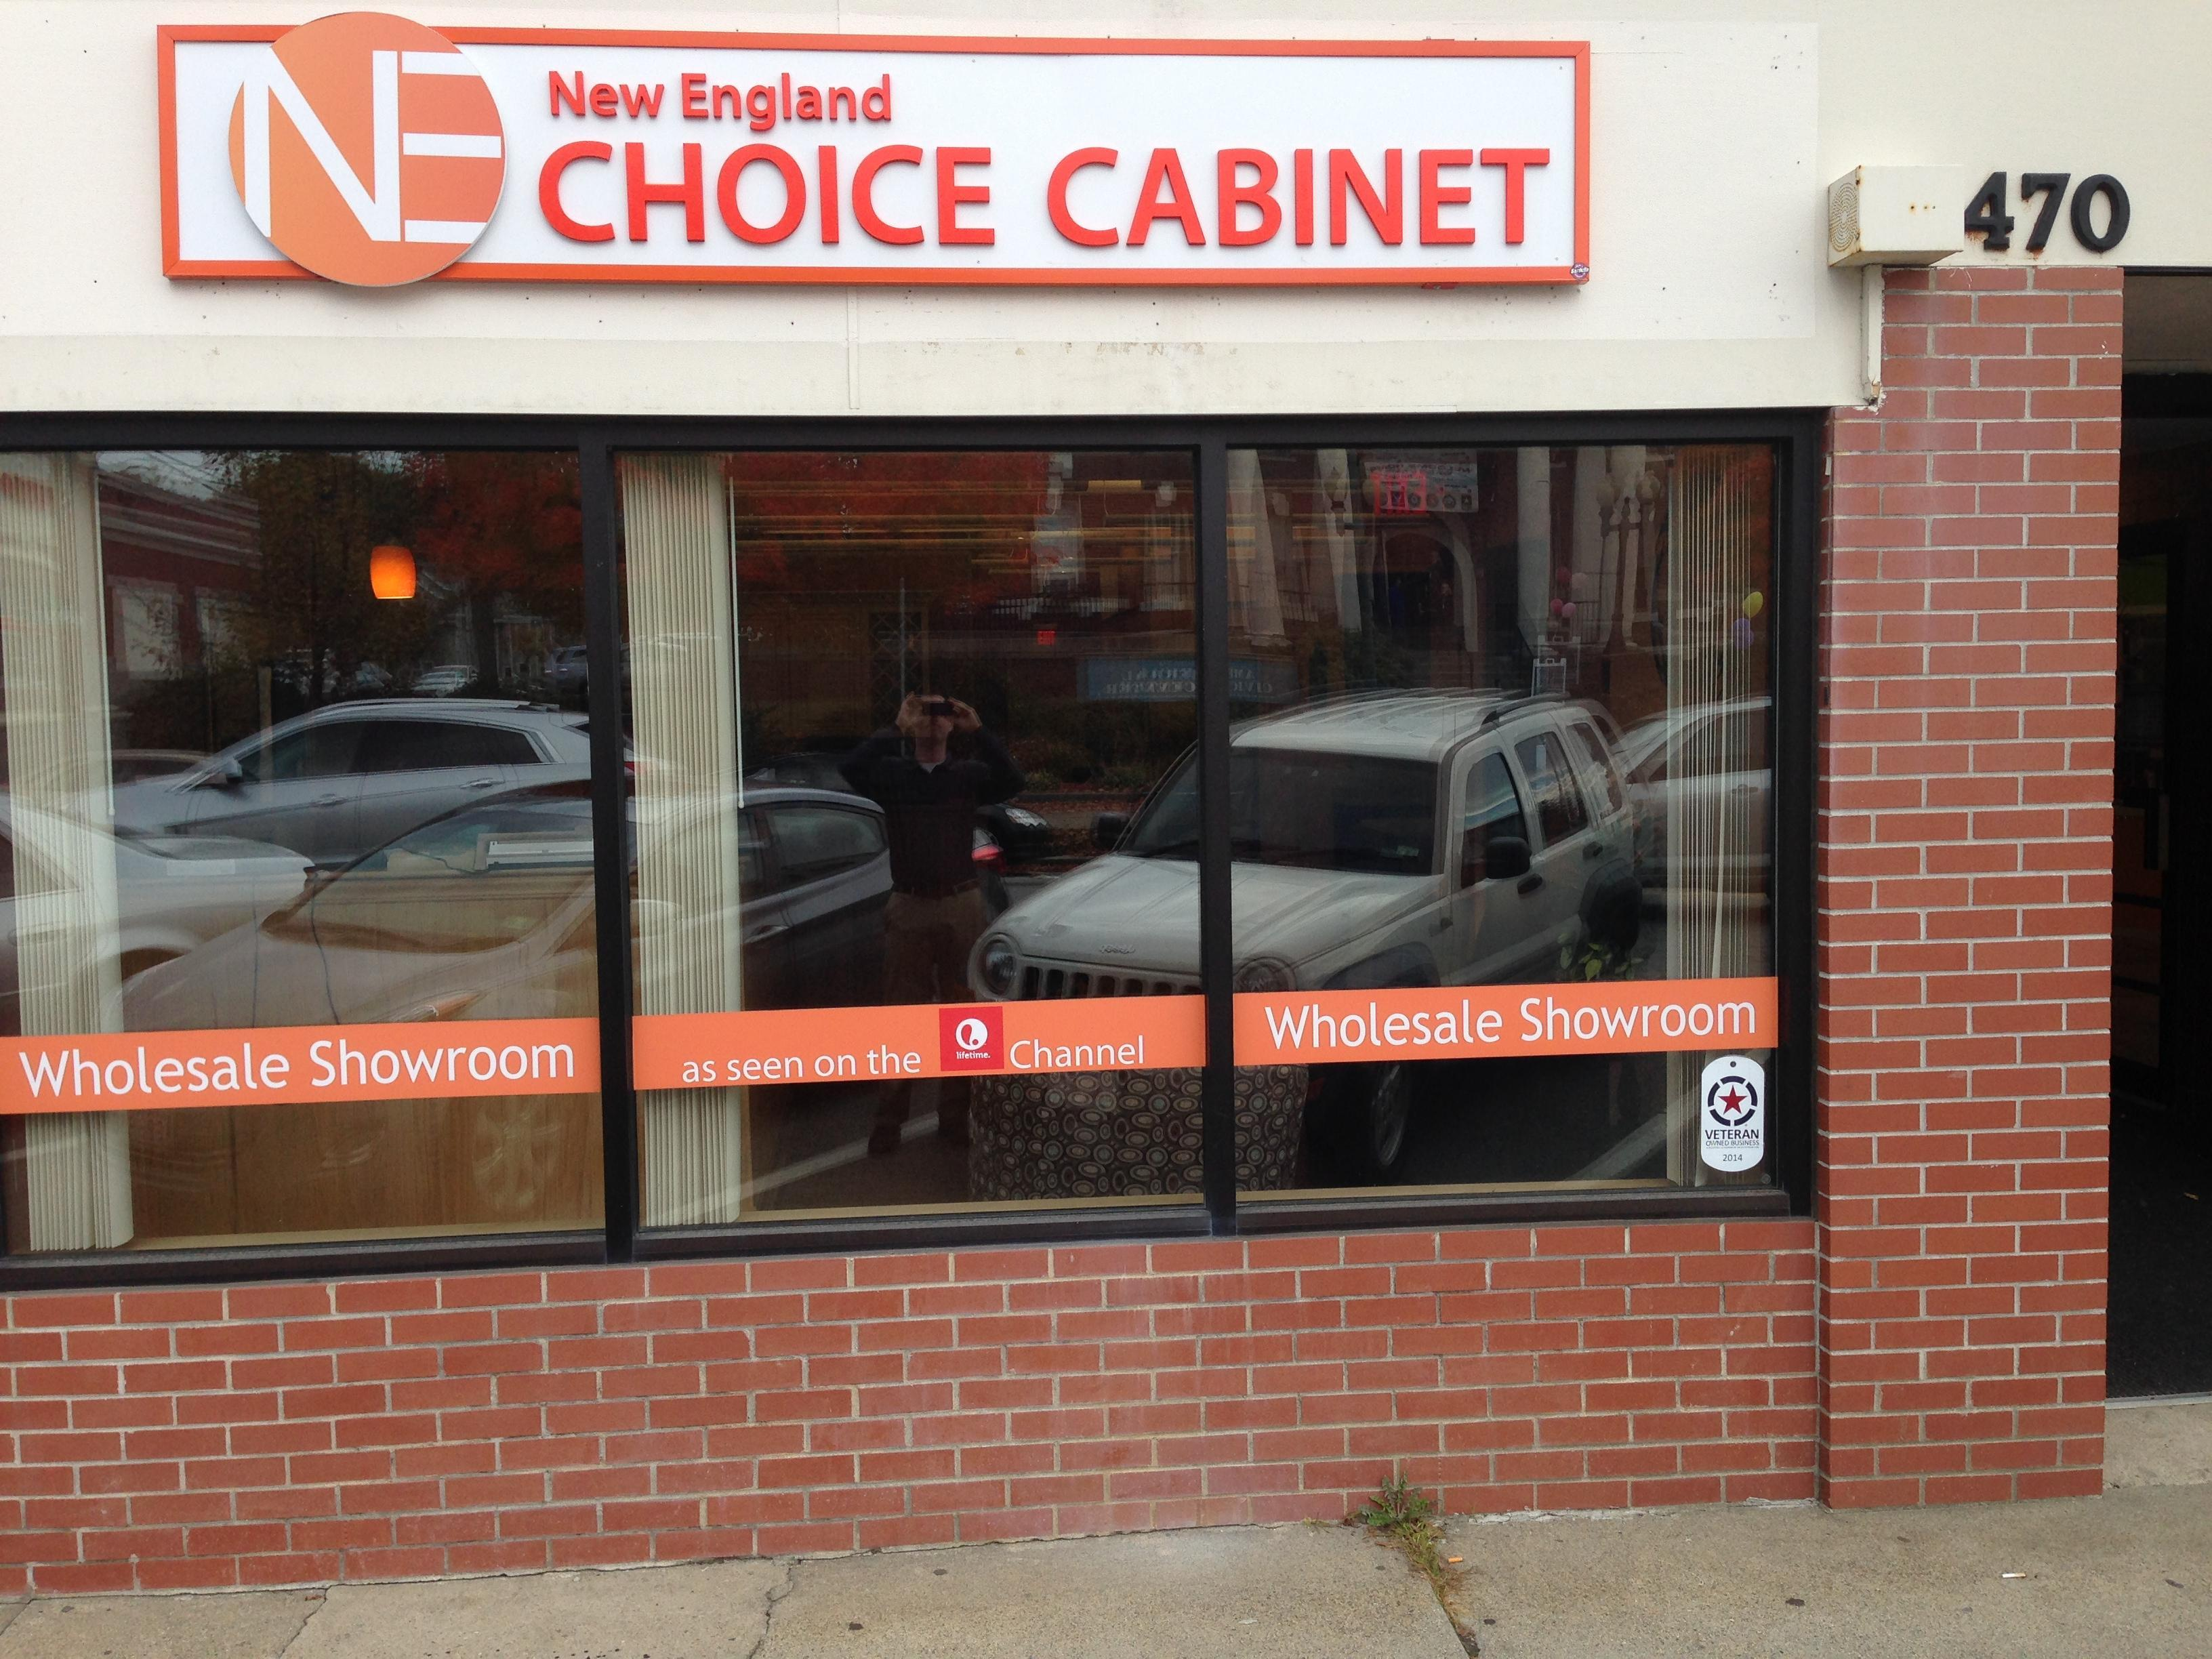 New England Choice Cabinets